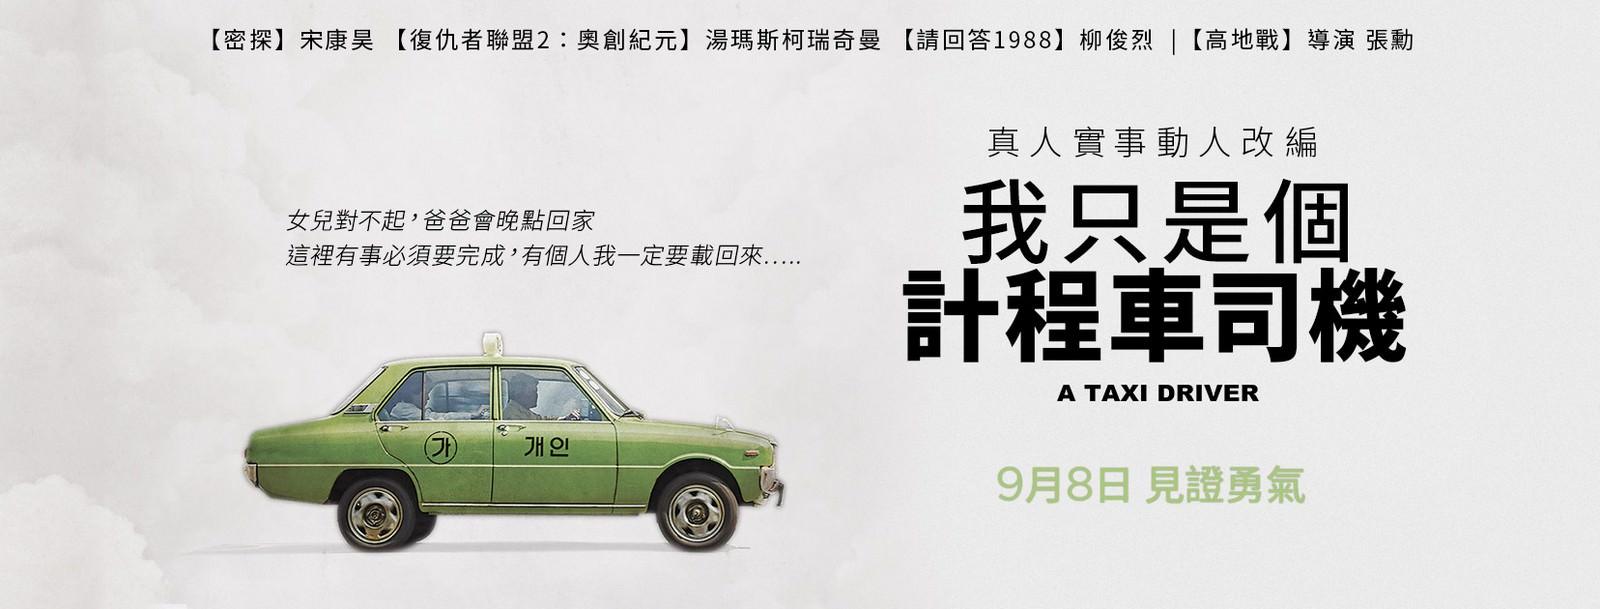 Movie, 택시 운전사(韓國, 2017年) / 我只是個計程車司機(台灣) / 逆權司機(香港) / 出租车司机(網路) / A Taxi Driver(英文), 電影海報, 台灣, 橫版